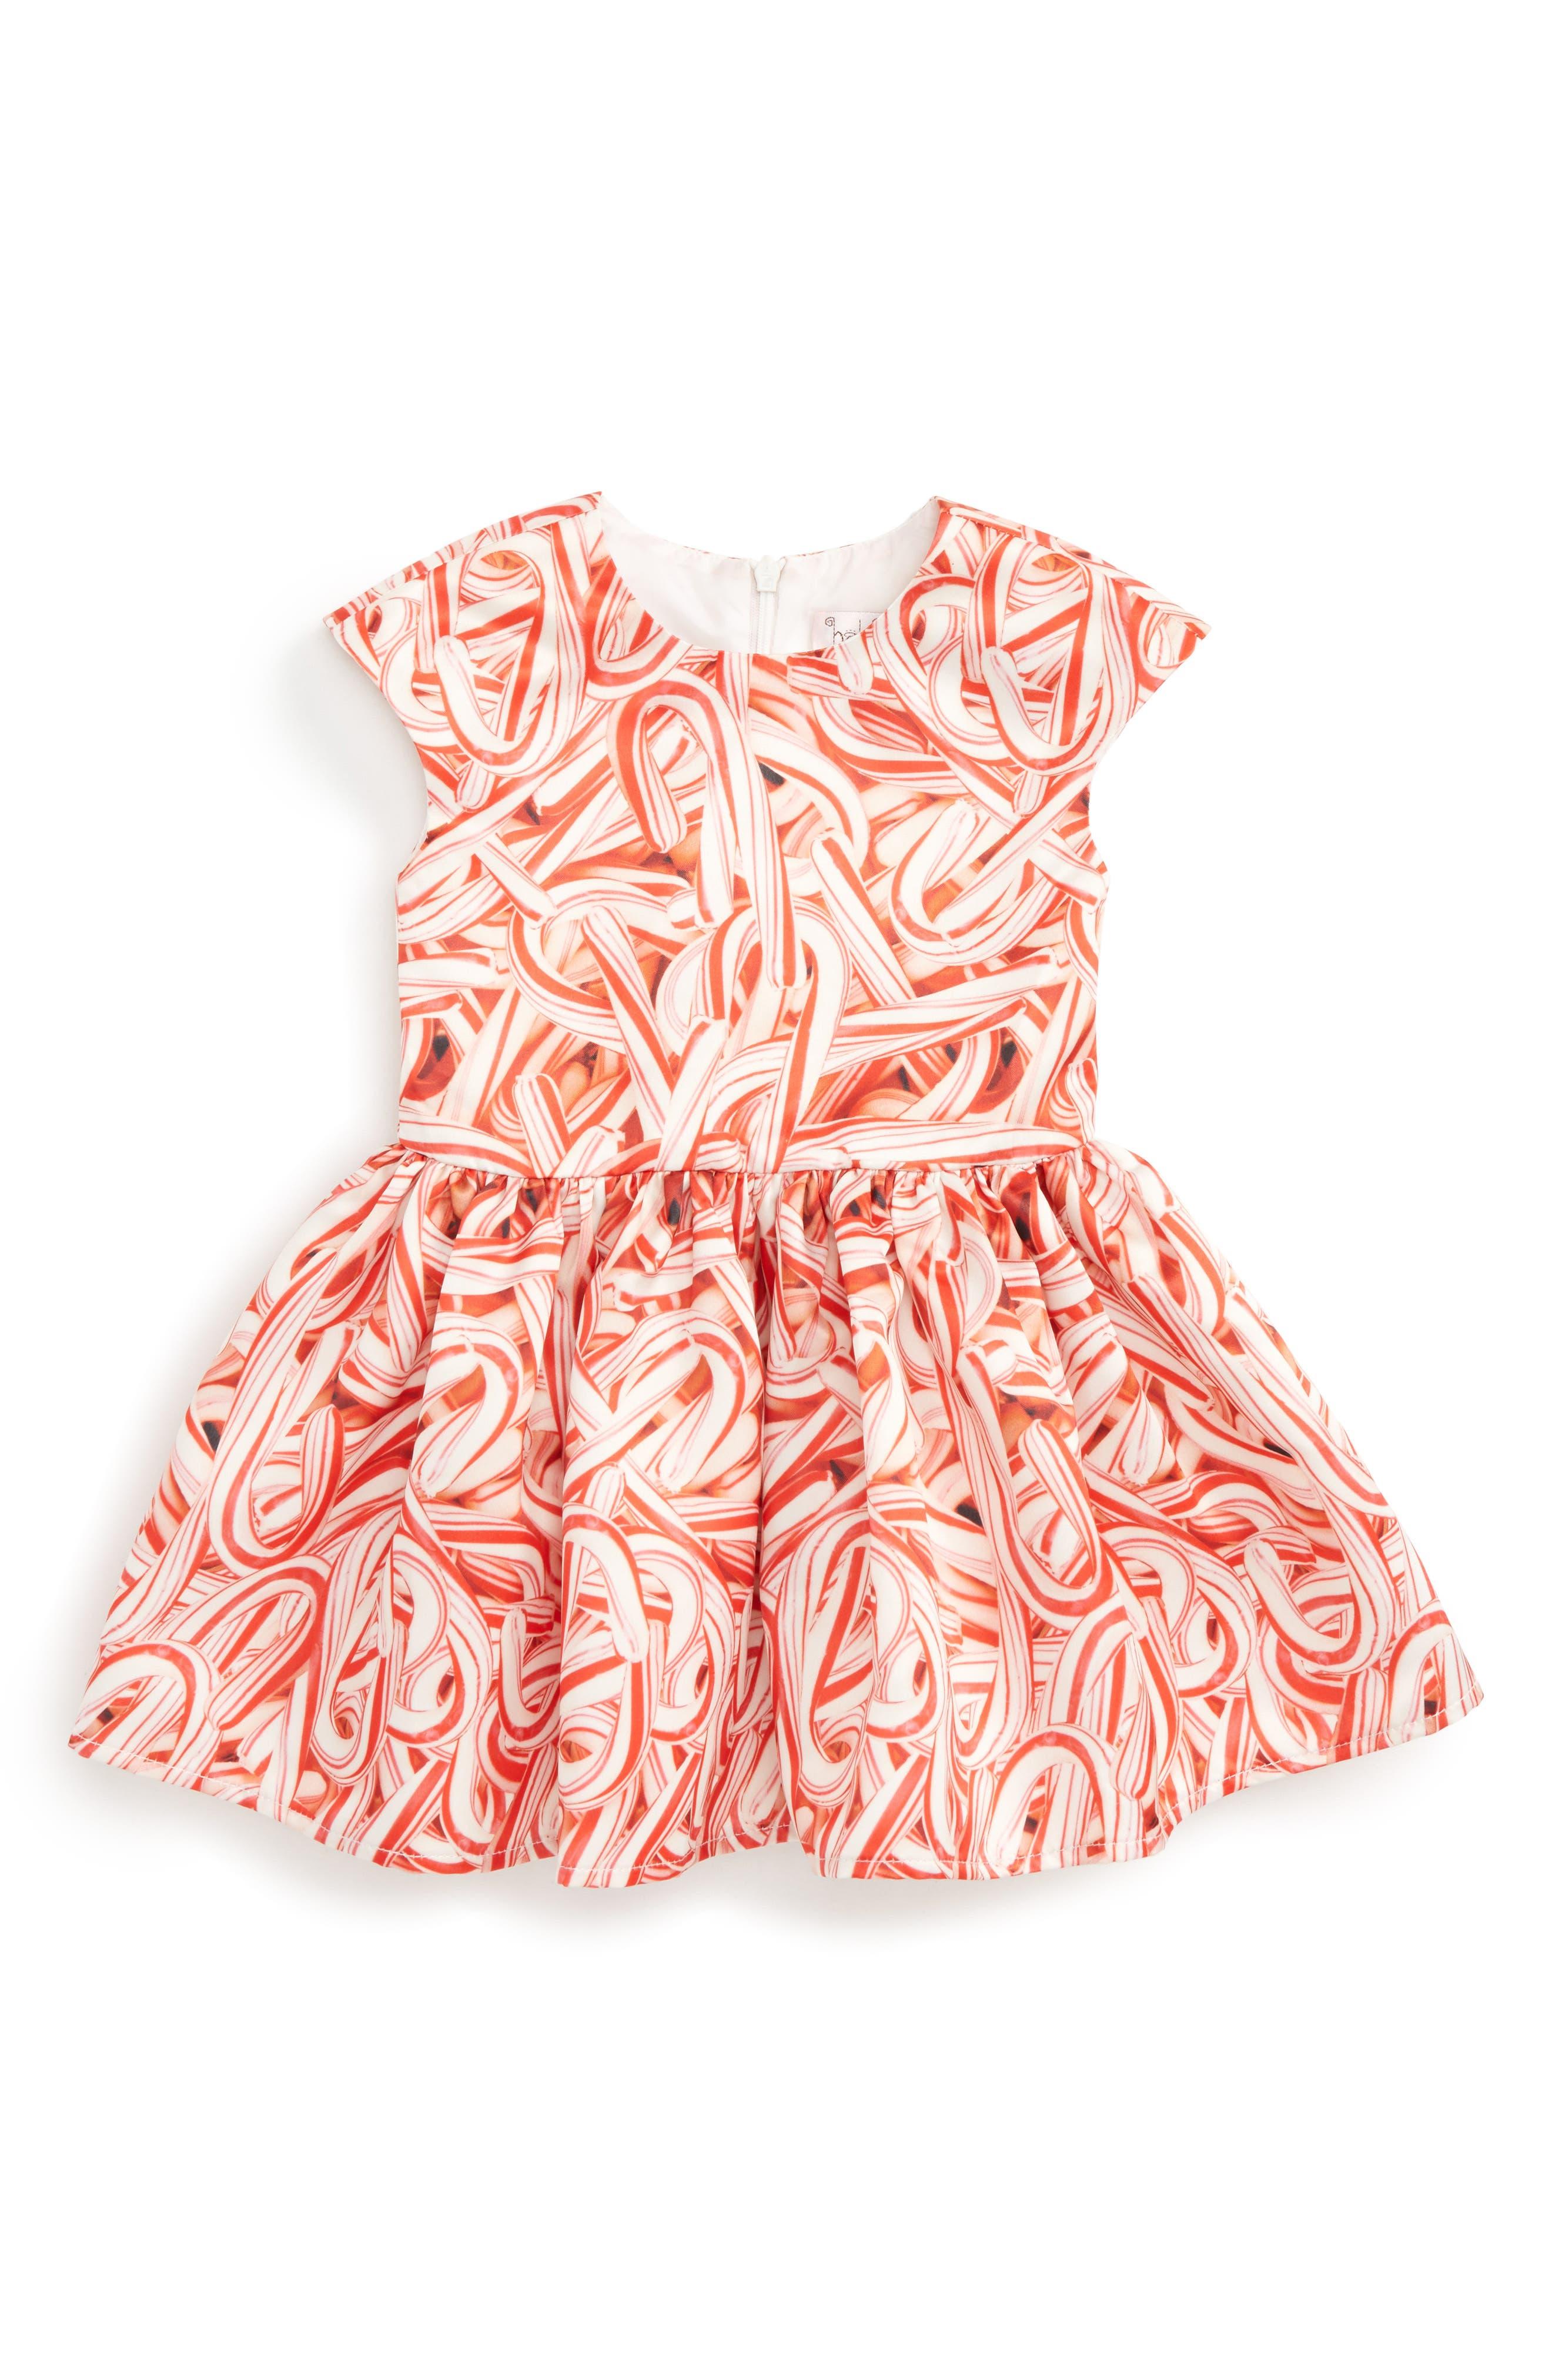 Alternate Image 1 Selected - Halabaloo Candy Cane Print Dress (Baby Girls)